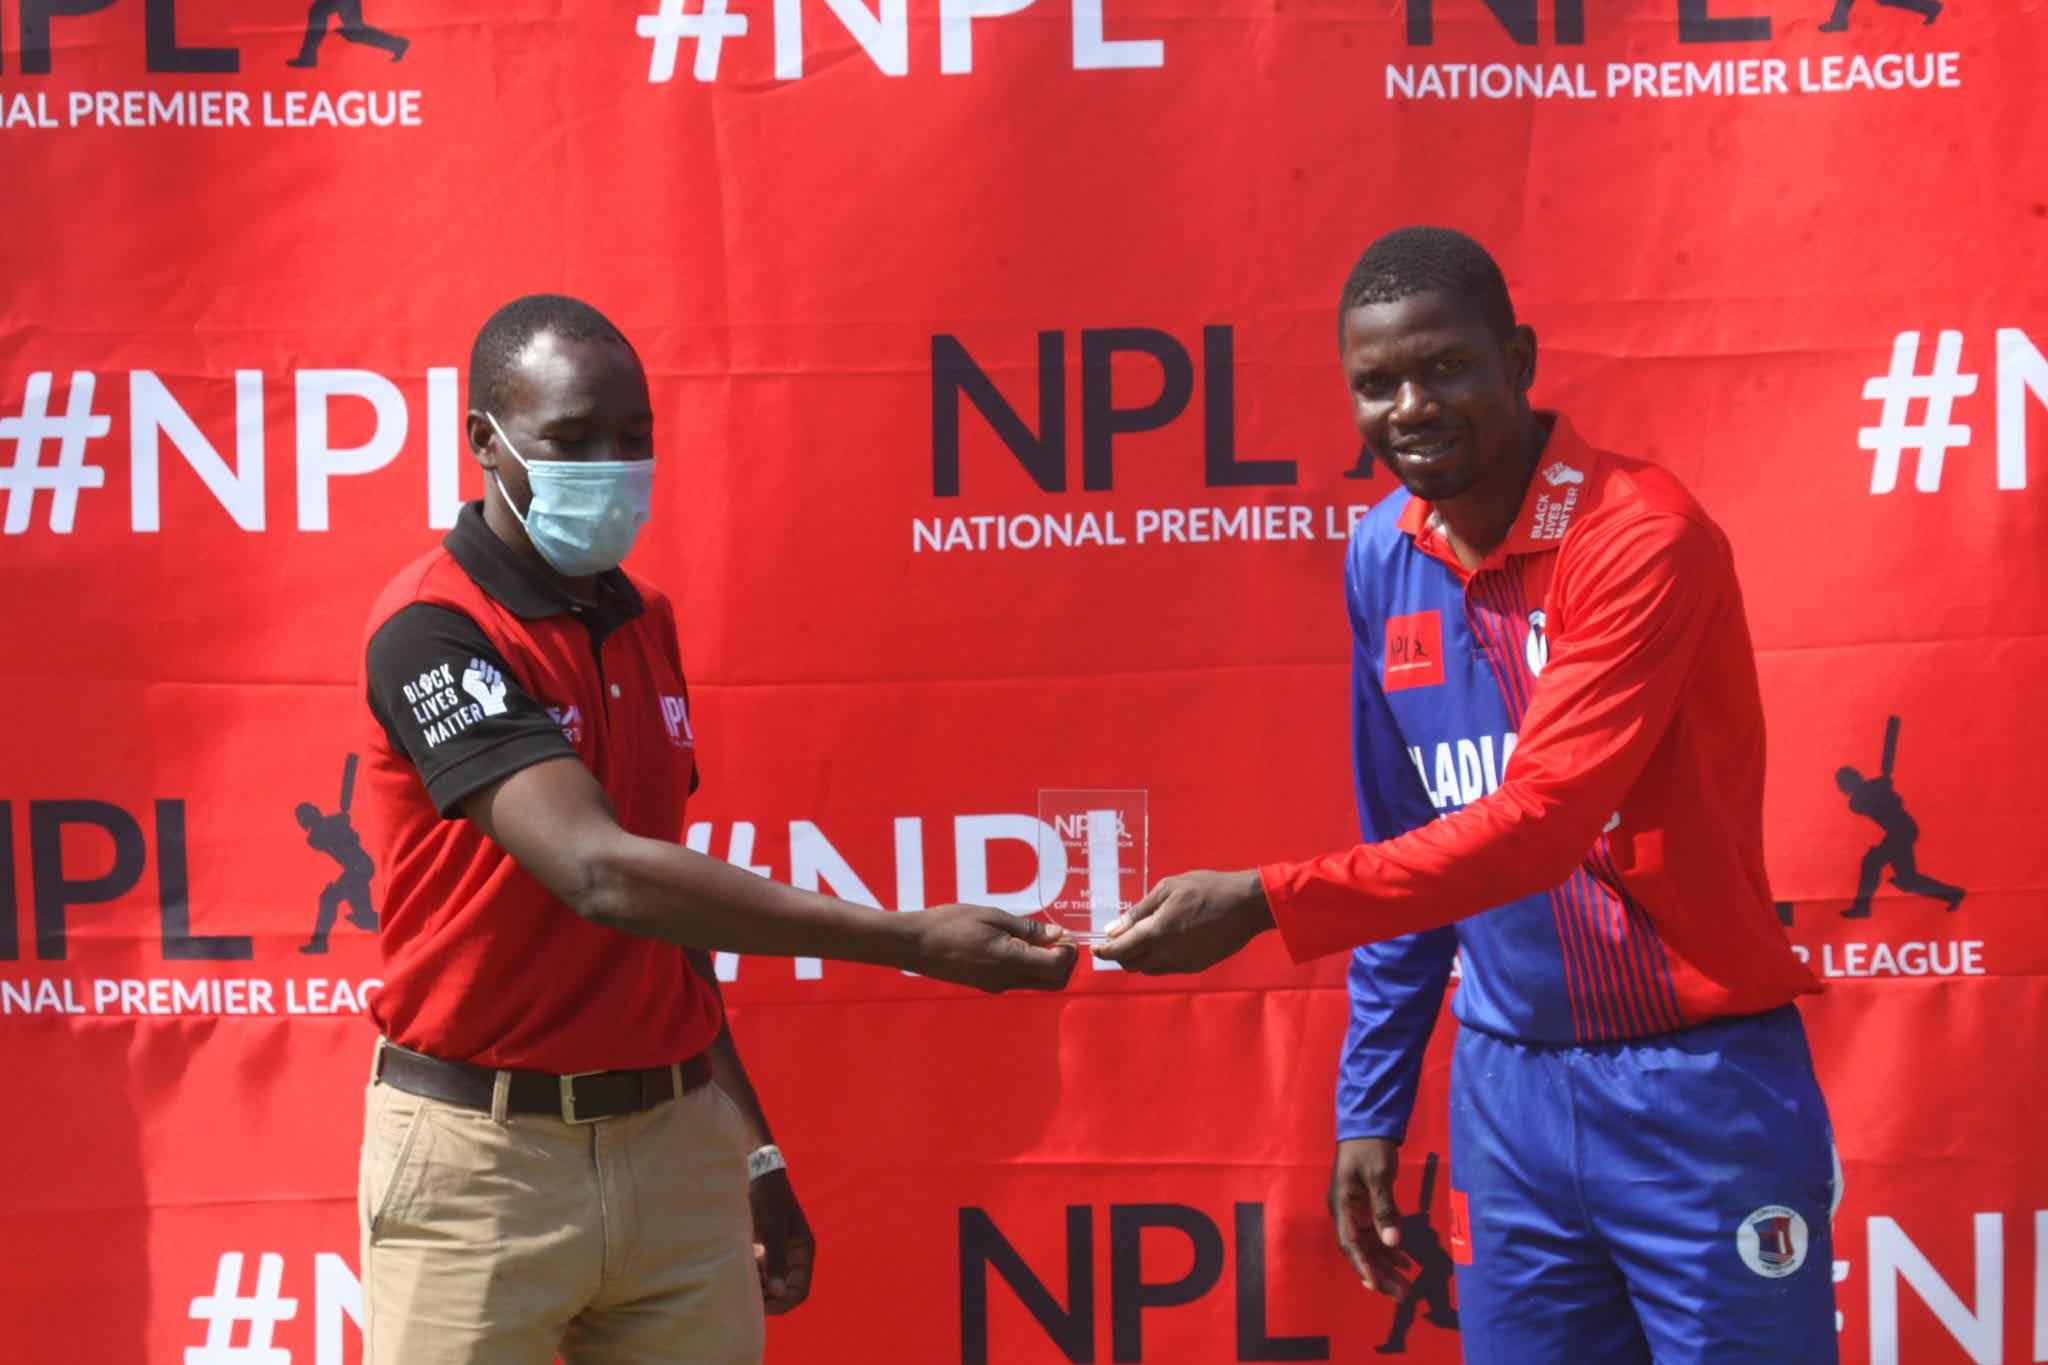 National Premier League cricket zimbabwe 2020